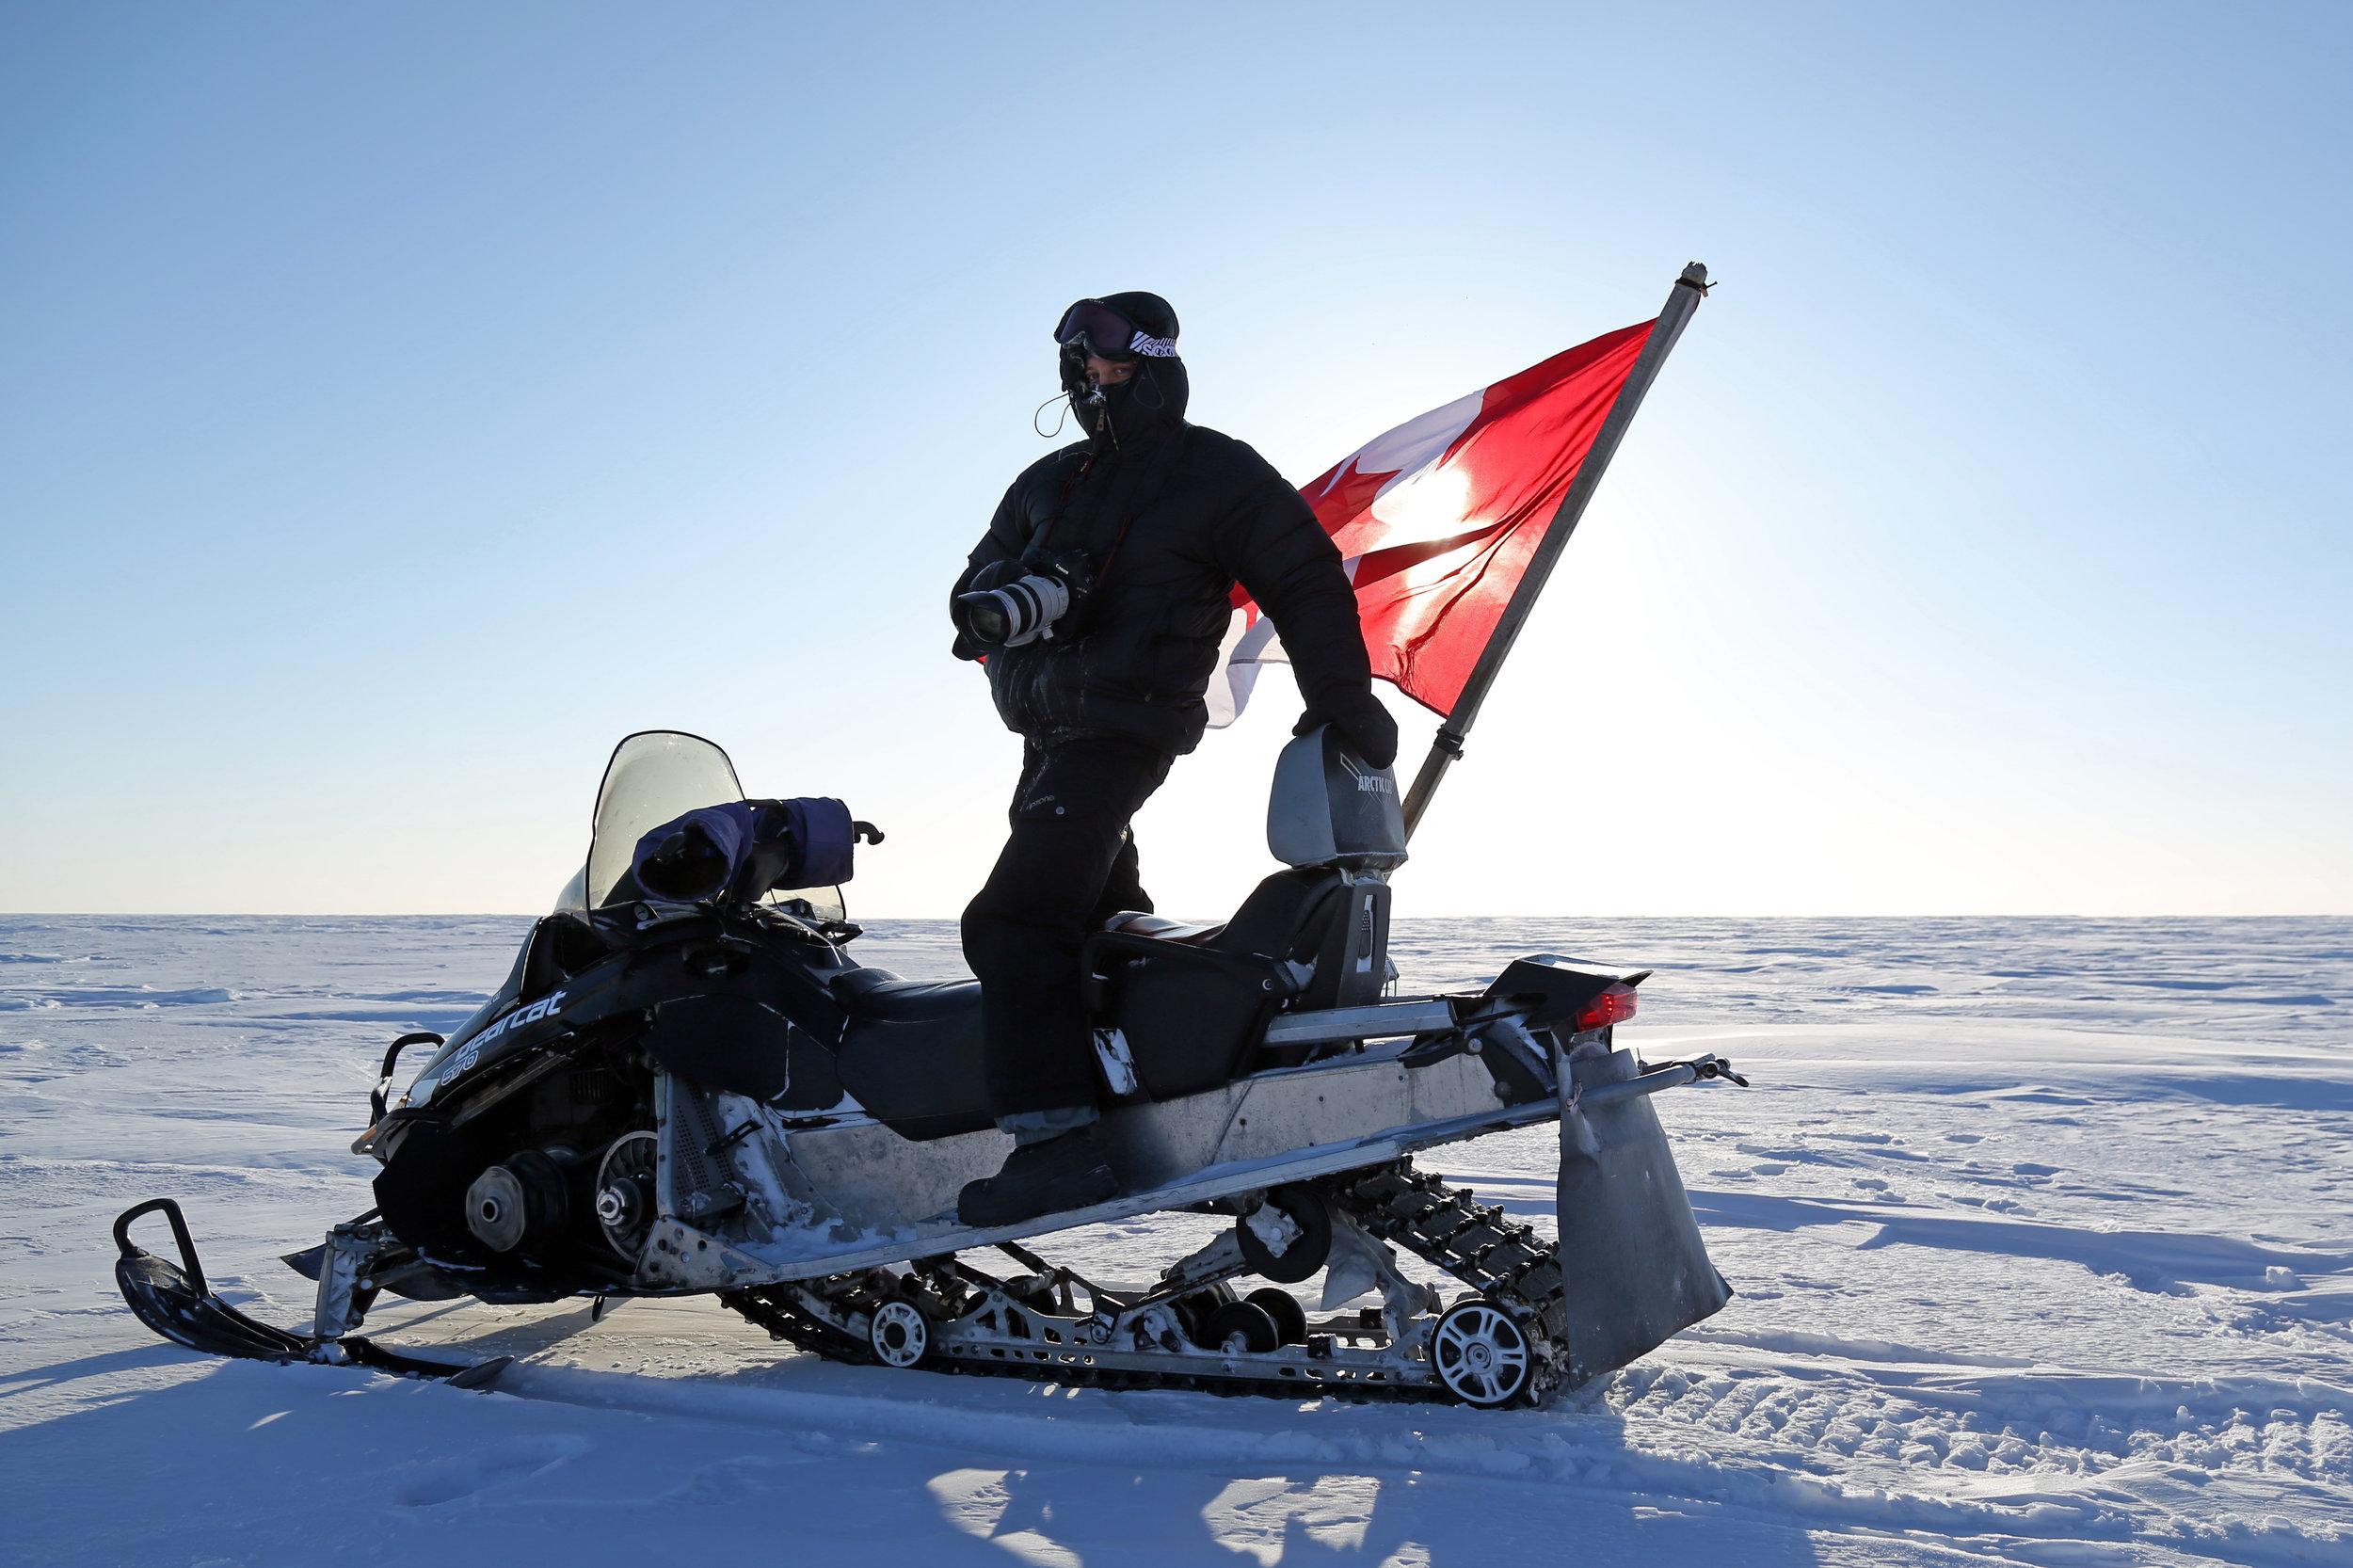 matt-riding-a-skidoo-in-nunavut-op-nunalivut-arctic-canadian-forces.jpg